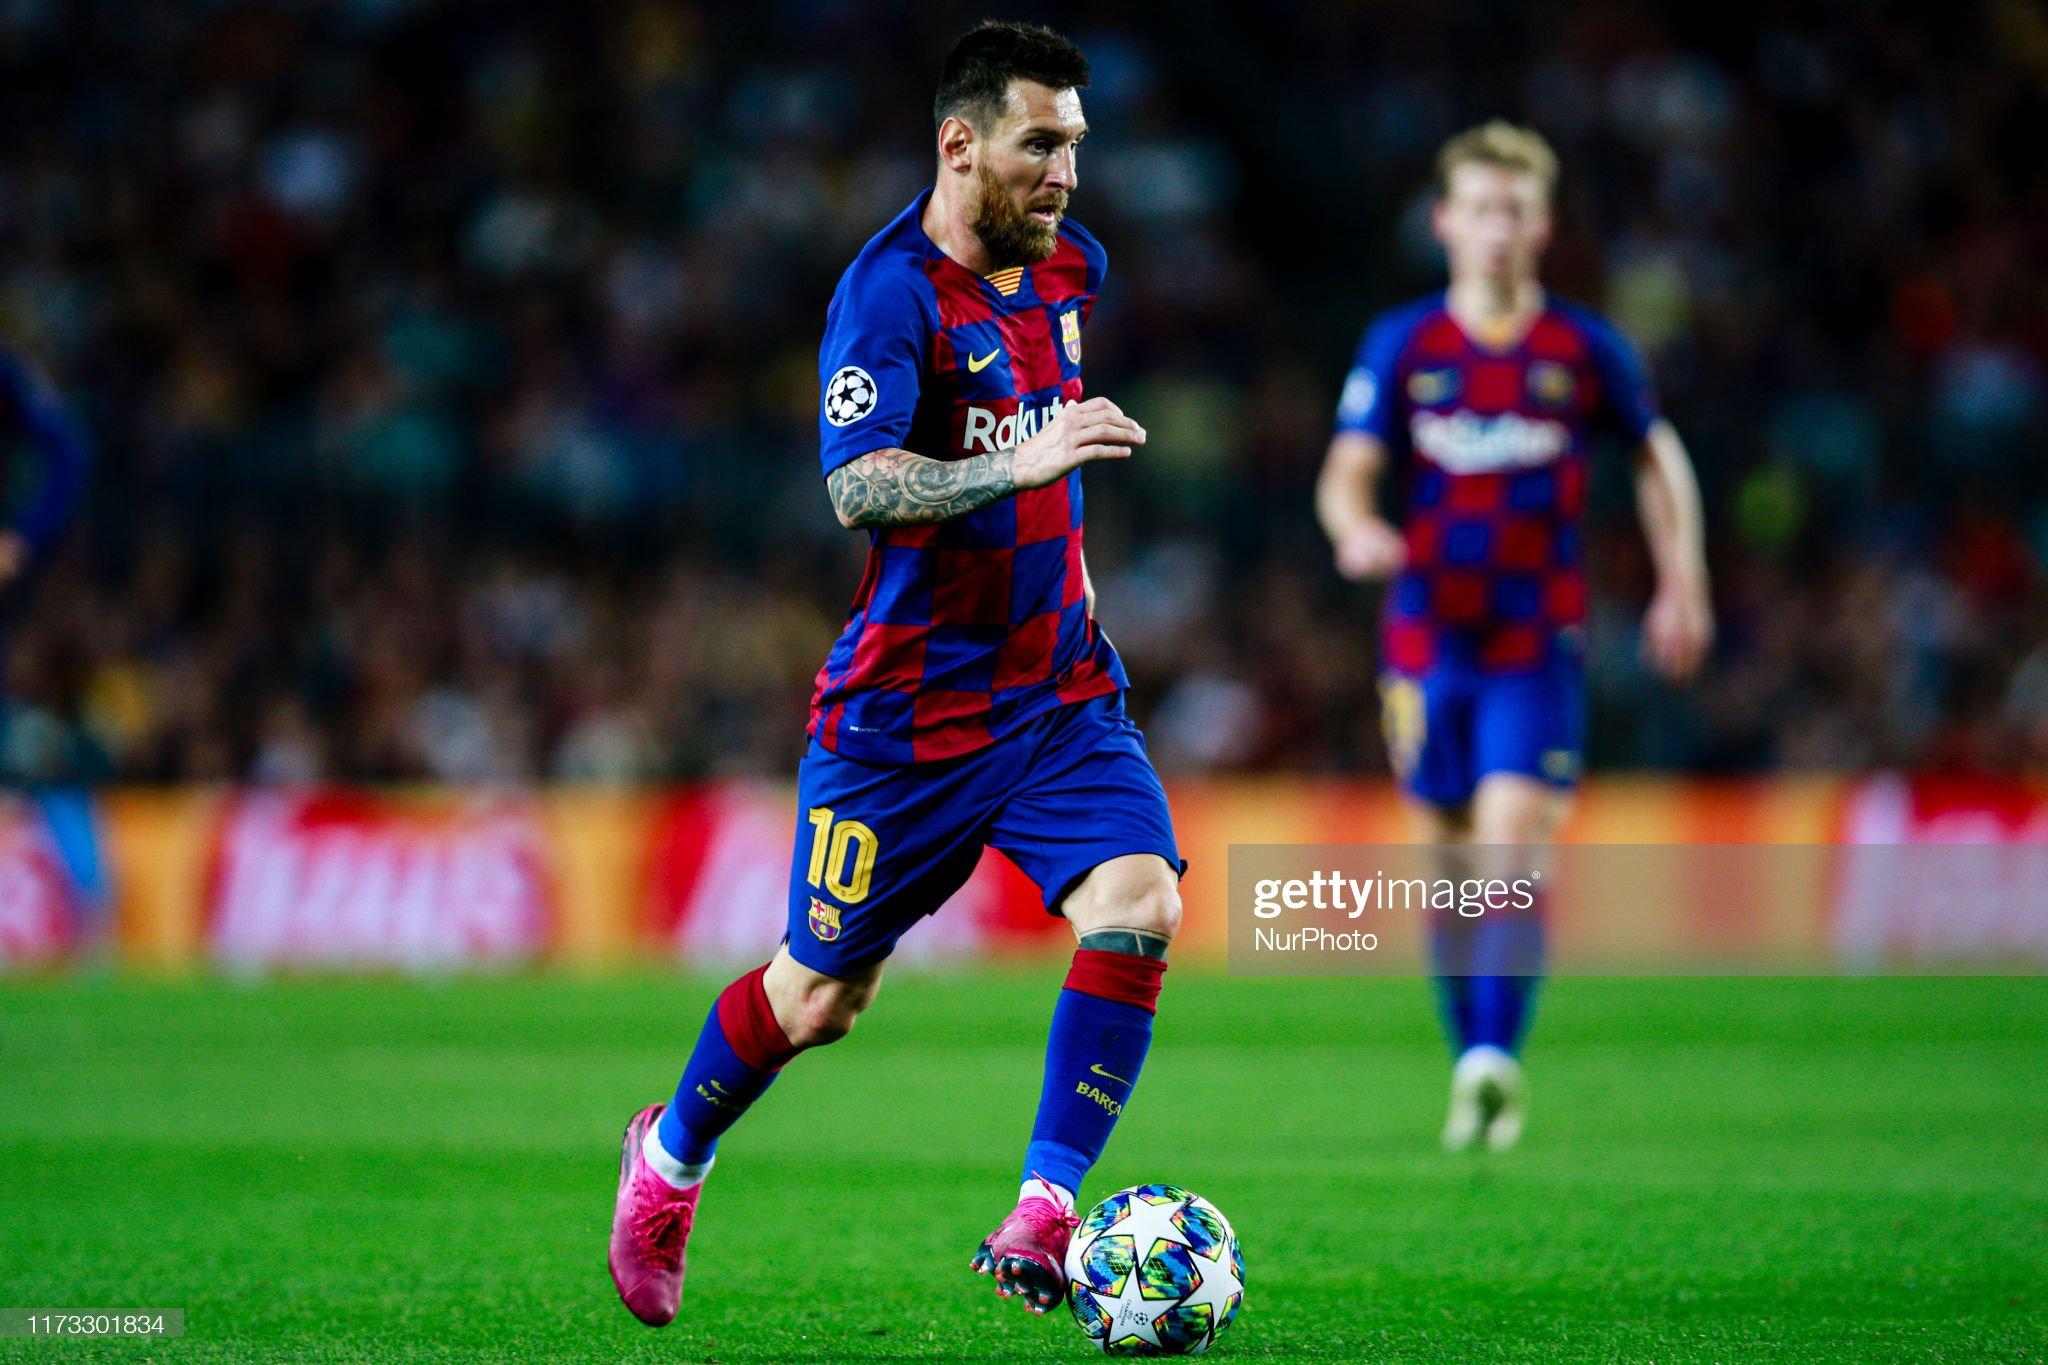 صور مباراة : برشلونة - إنتر 2-1 ( 02-10-2019 )  Lionel-messi-from-argentina-of-fc-barcelona-during-the-uefa-champions-picture-id1173301834?s=2048x2048